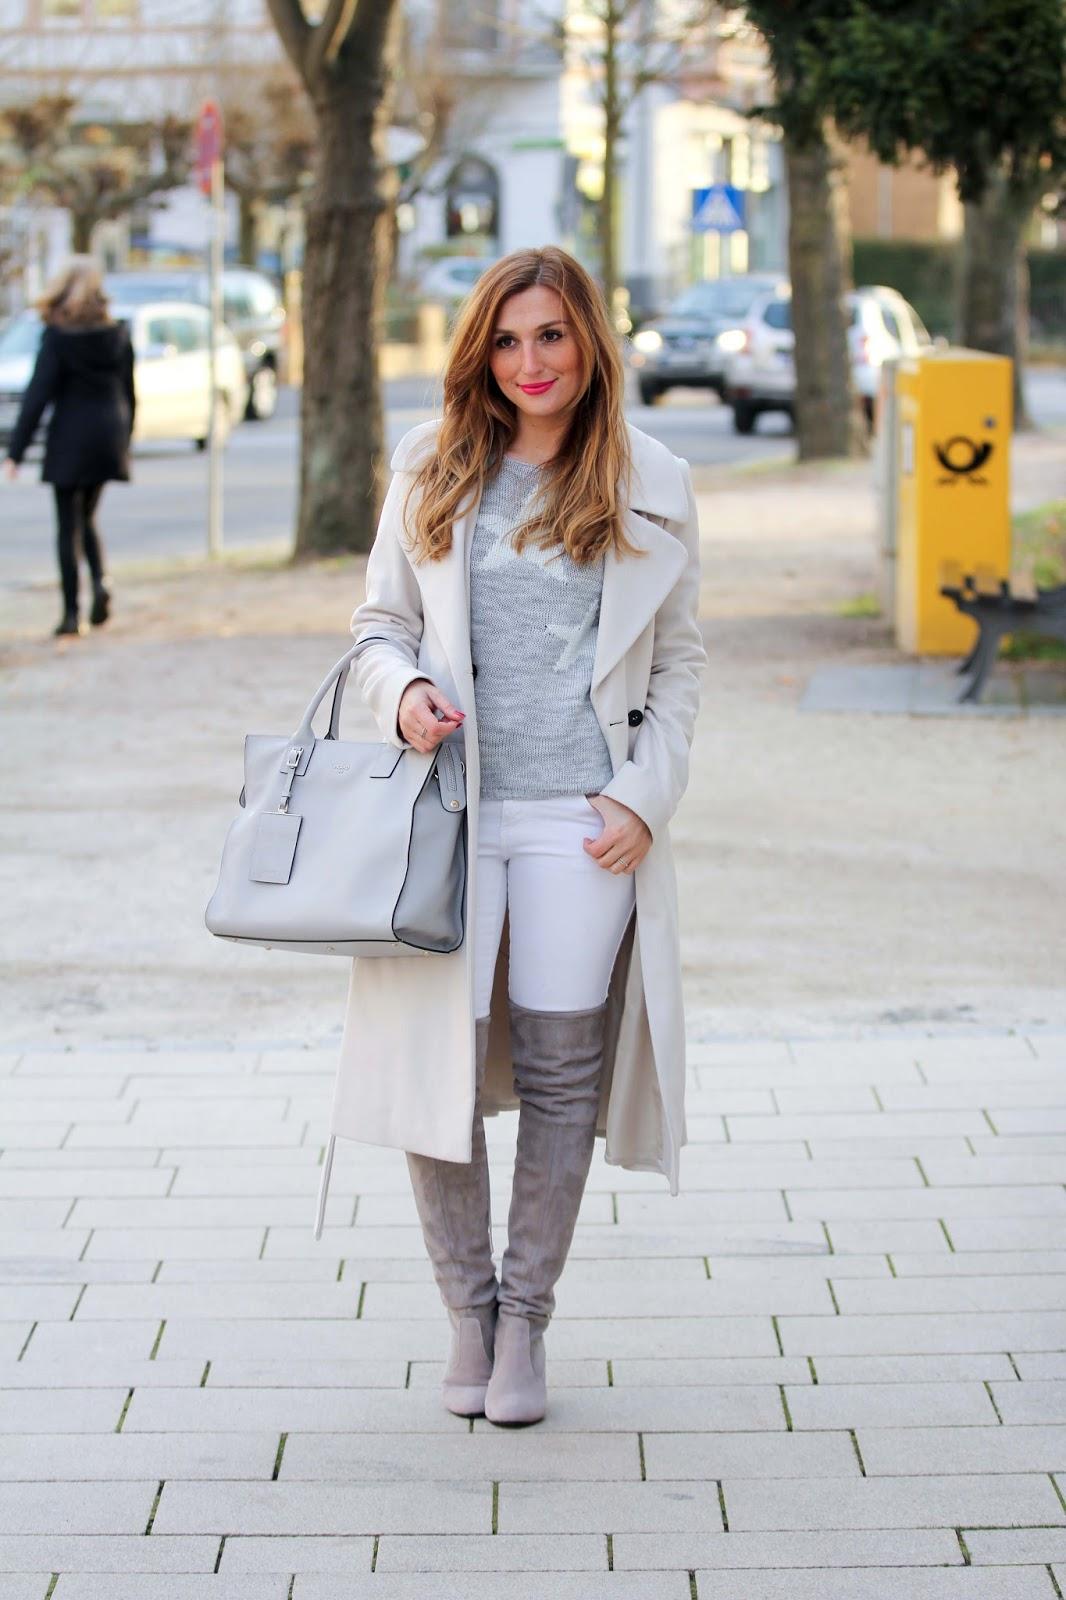 Fashionstylebyjohanna-Haare-Fashionstylebyjohanna-Hair-STYLE-overkees-weiße Hose